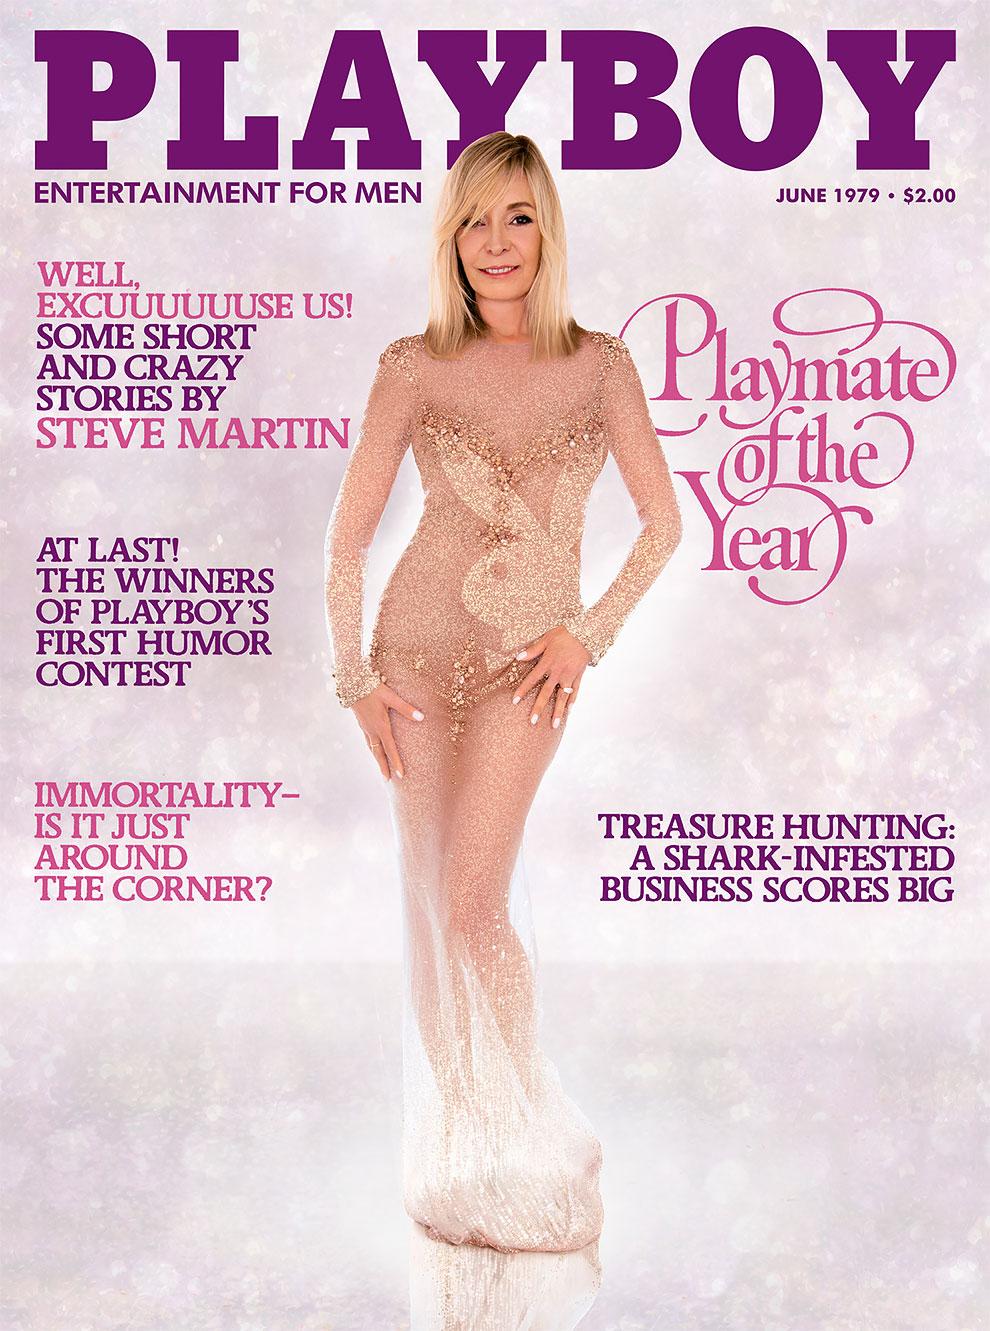 Playboy Playmates 30 anos despues 10